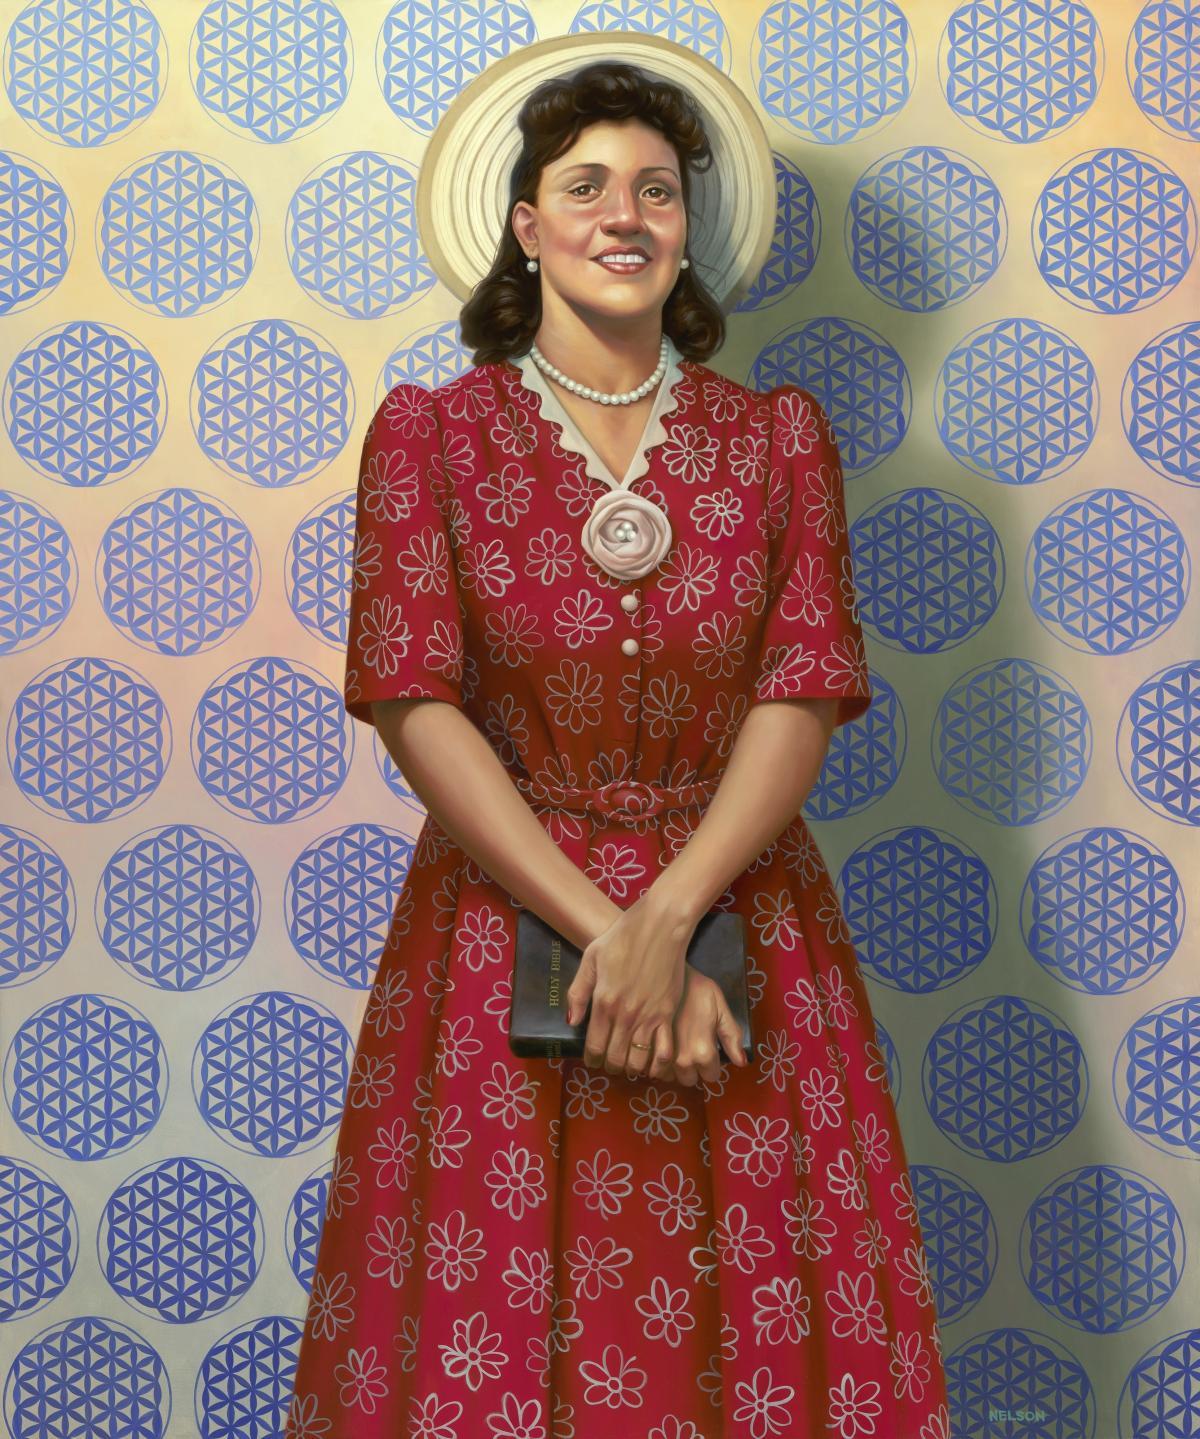 The Mother of Modern Medicine by Kadir Nelson, oil on linen, 2017.